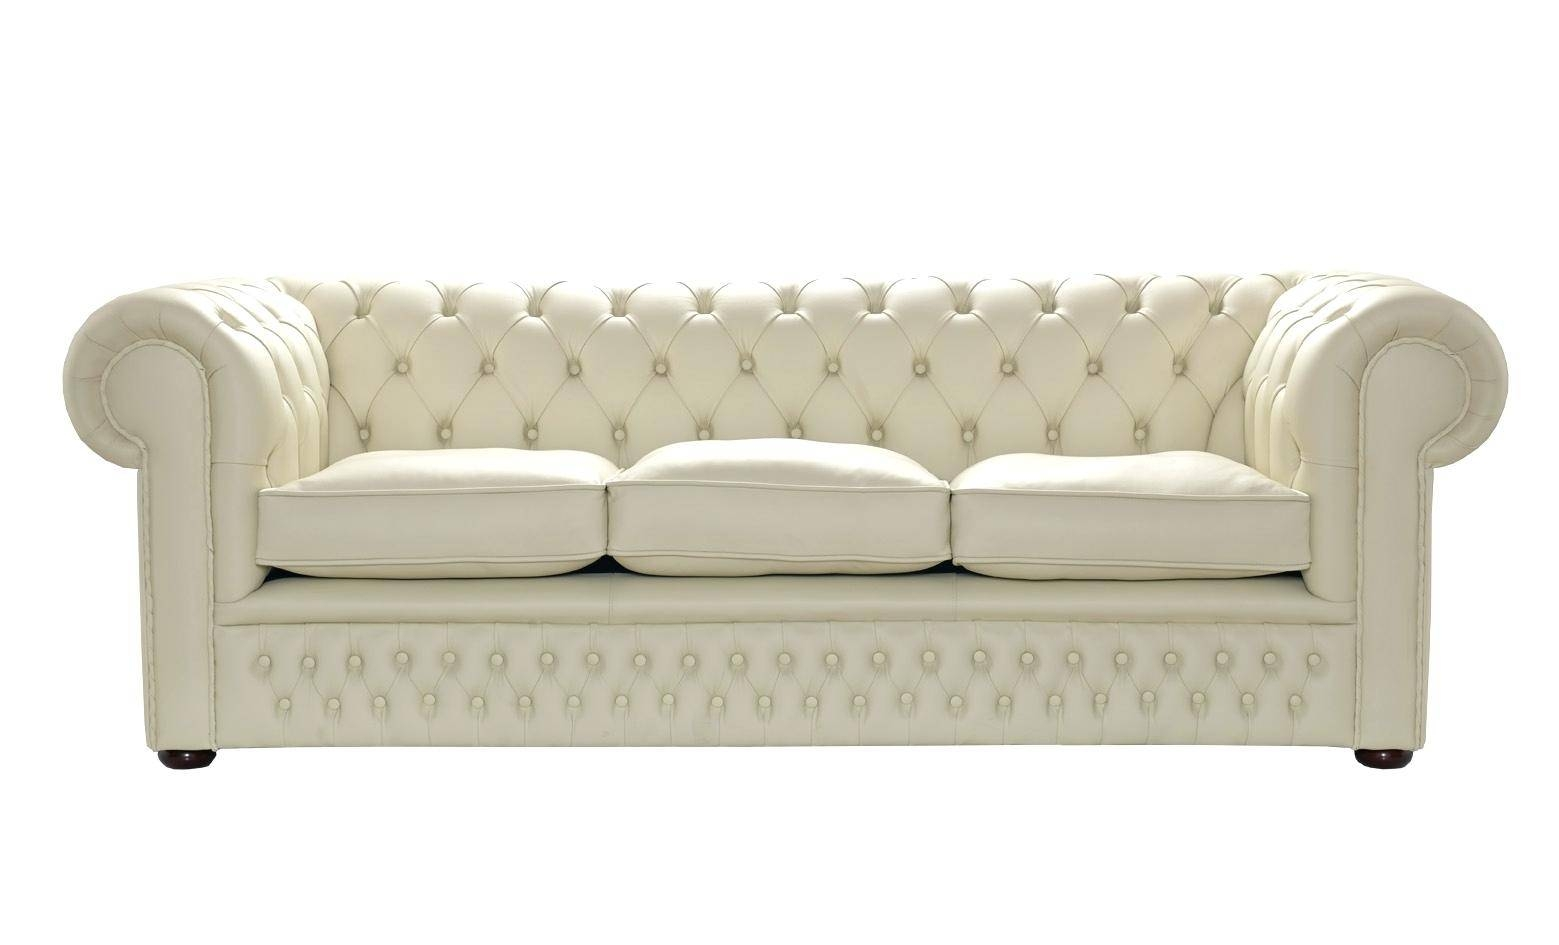 Sofas Center : Cream Colored Sofa Sets Color And Loveseatcream pertaining to Cream Colored Sofa (Image 20 of 25)